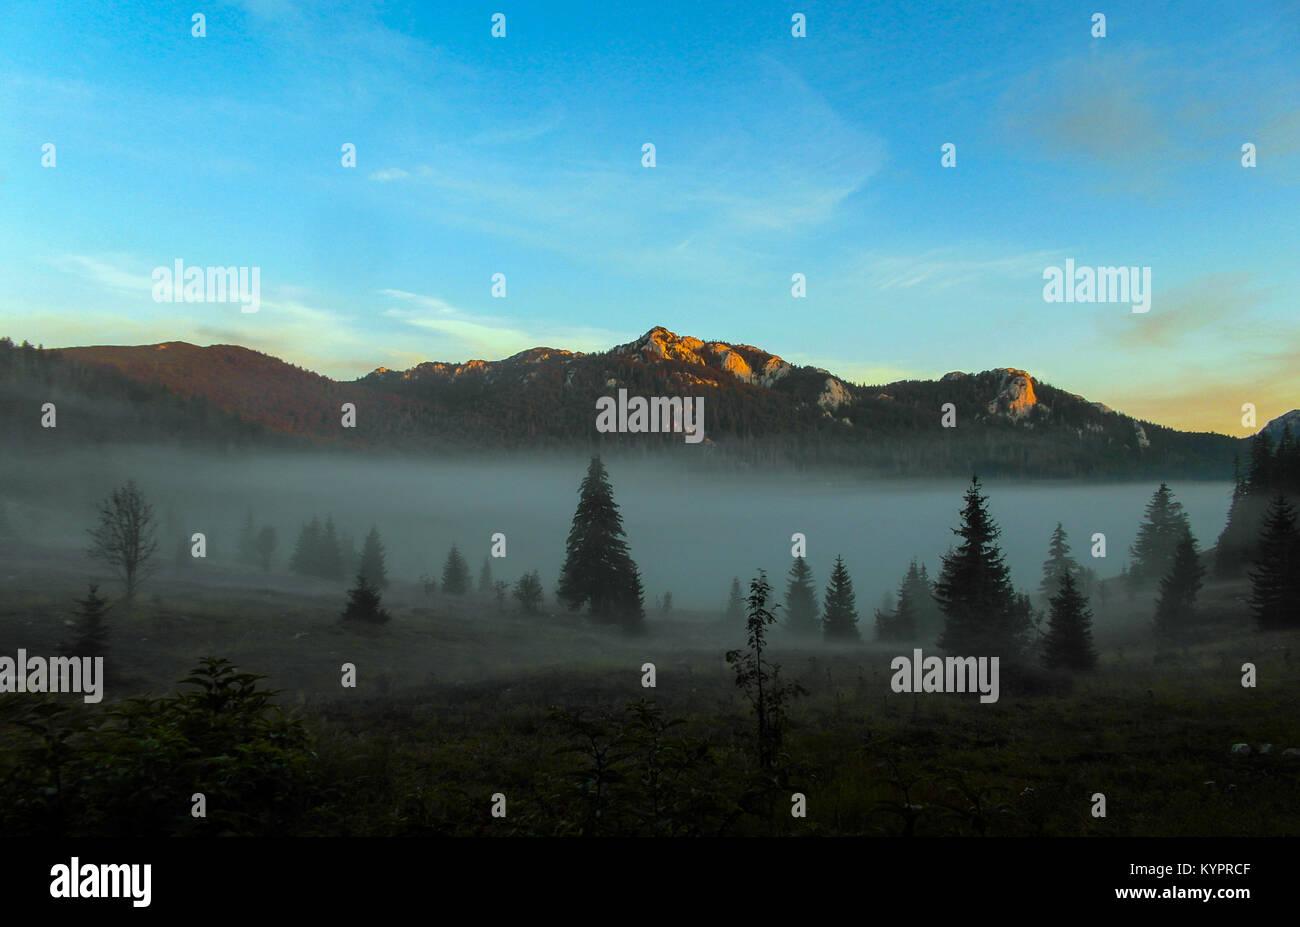 Early morning with mist at Lubenovac, the Northern Velebit, Croatia Stock Photo